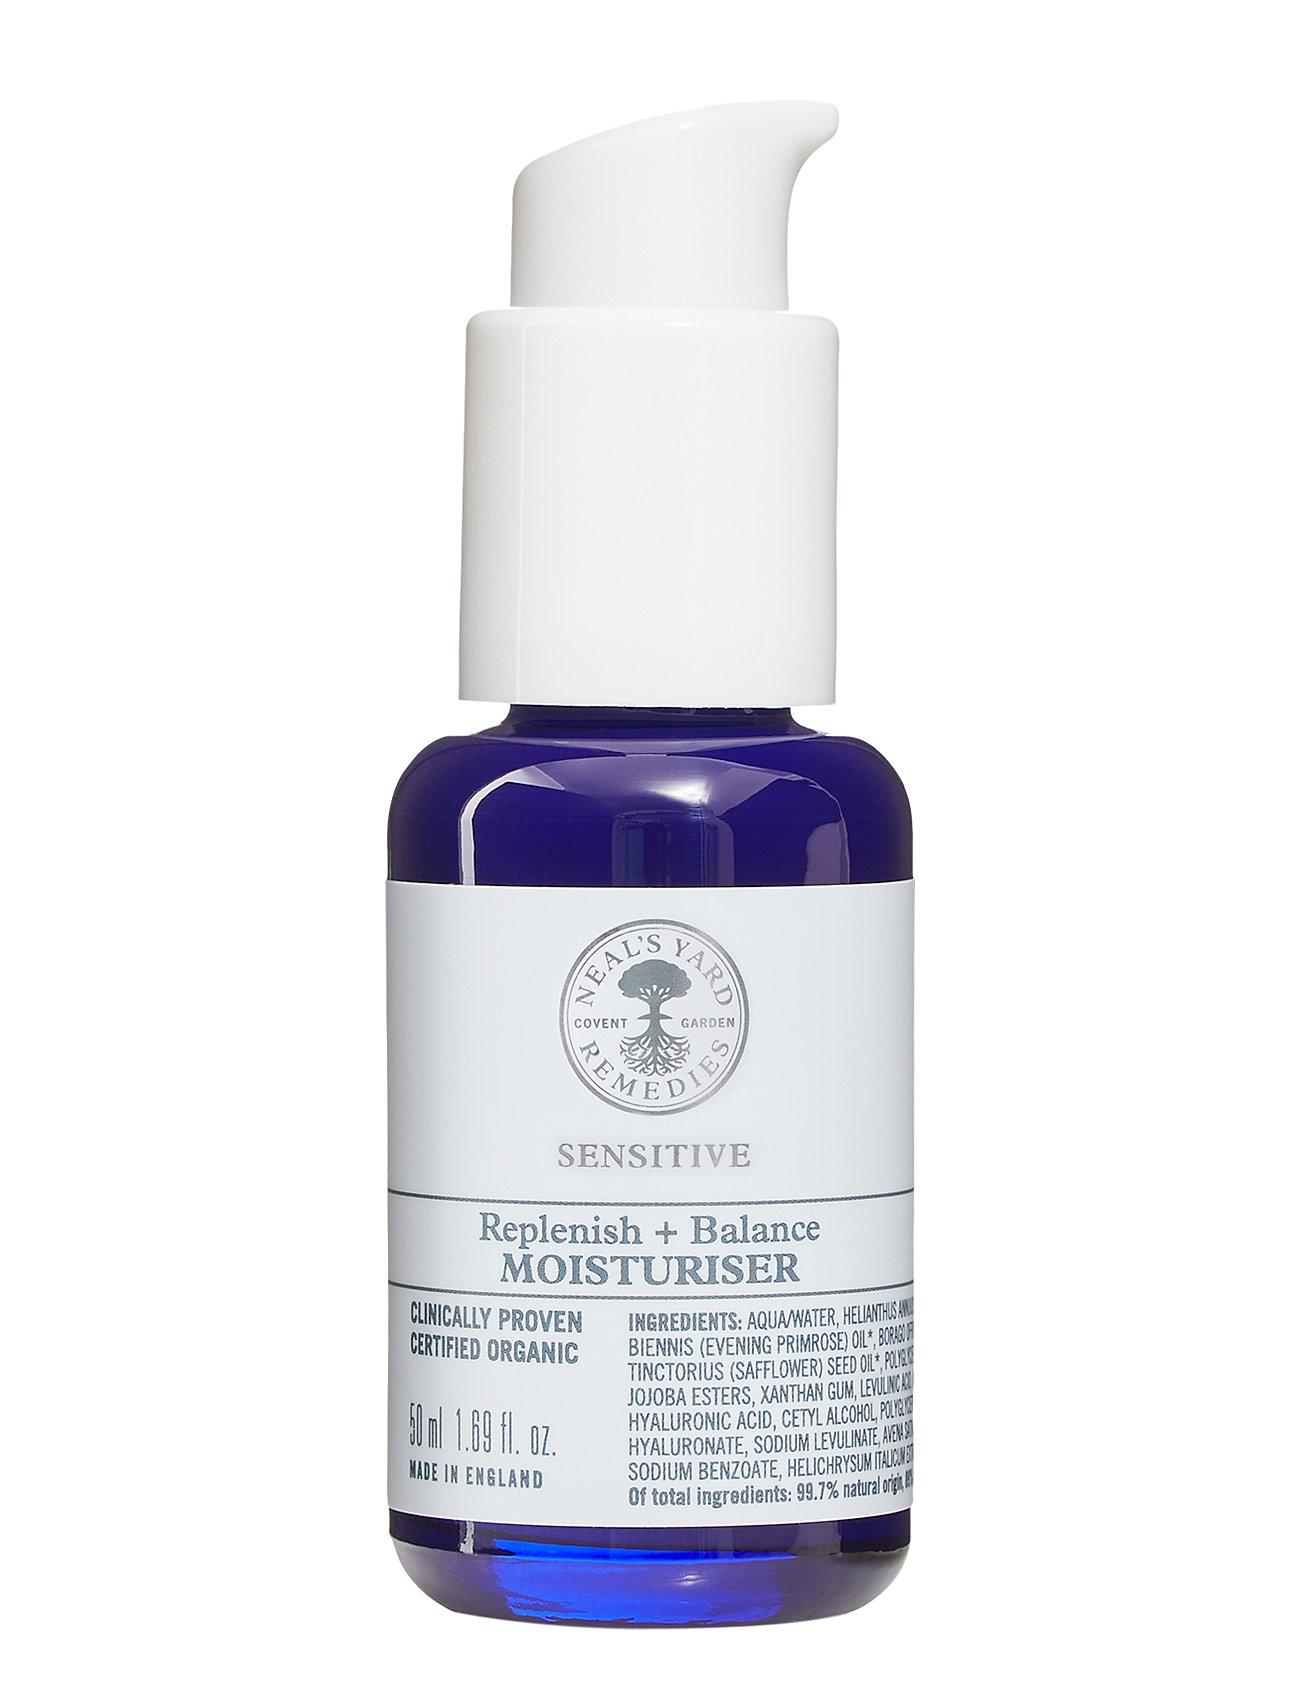 Neal's Yard Remedies Sensitive Replenish + Balance Moisturiser - CLEAR